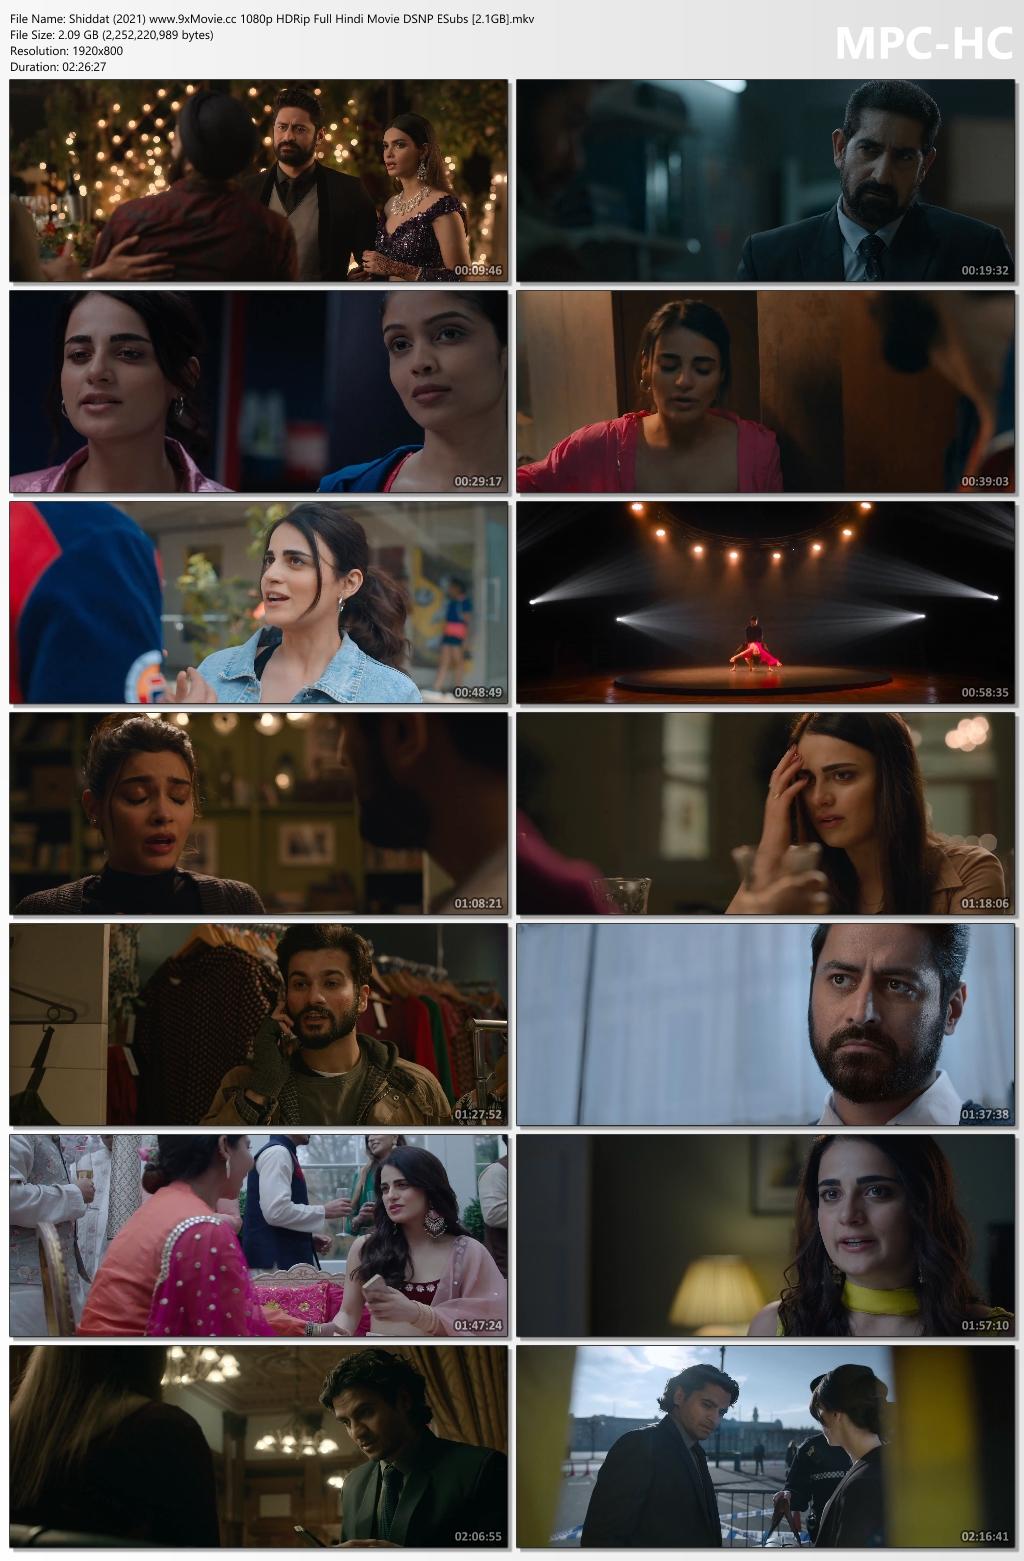 Shiddat-2021-www-9x-Movie-cc-1080p-HDRip-Full-Hindi-Movie-DSNP-ESubs-2-1-GB-mkv